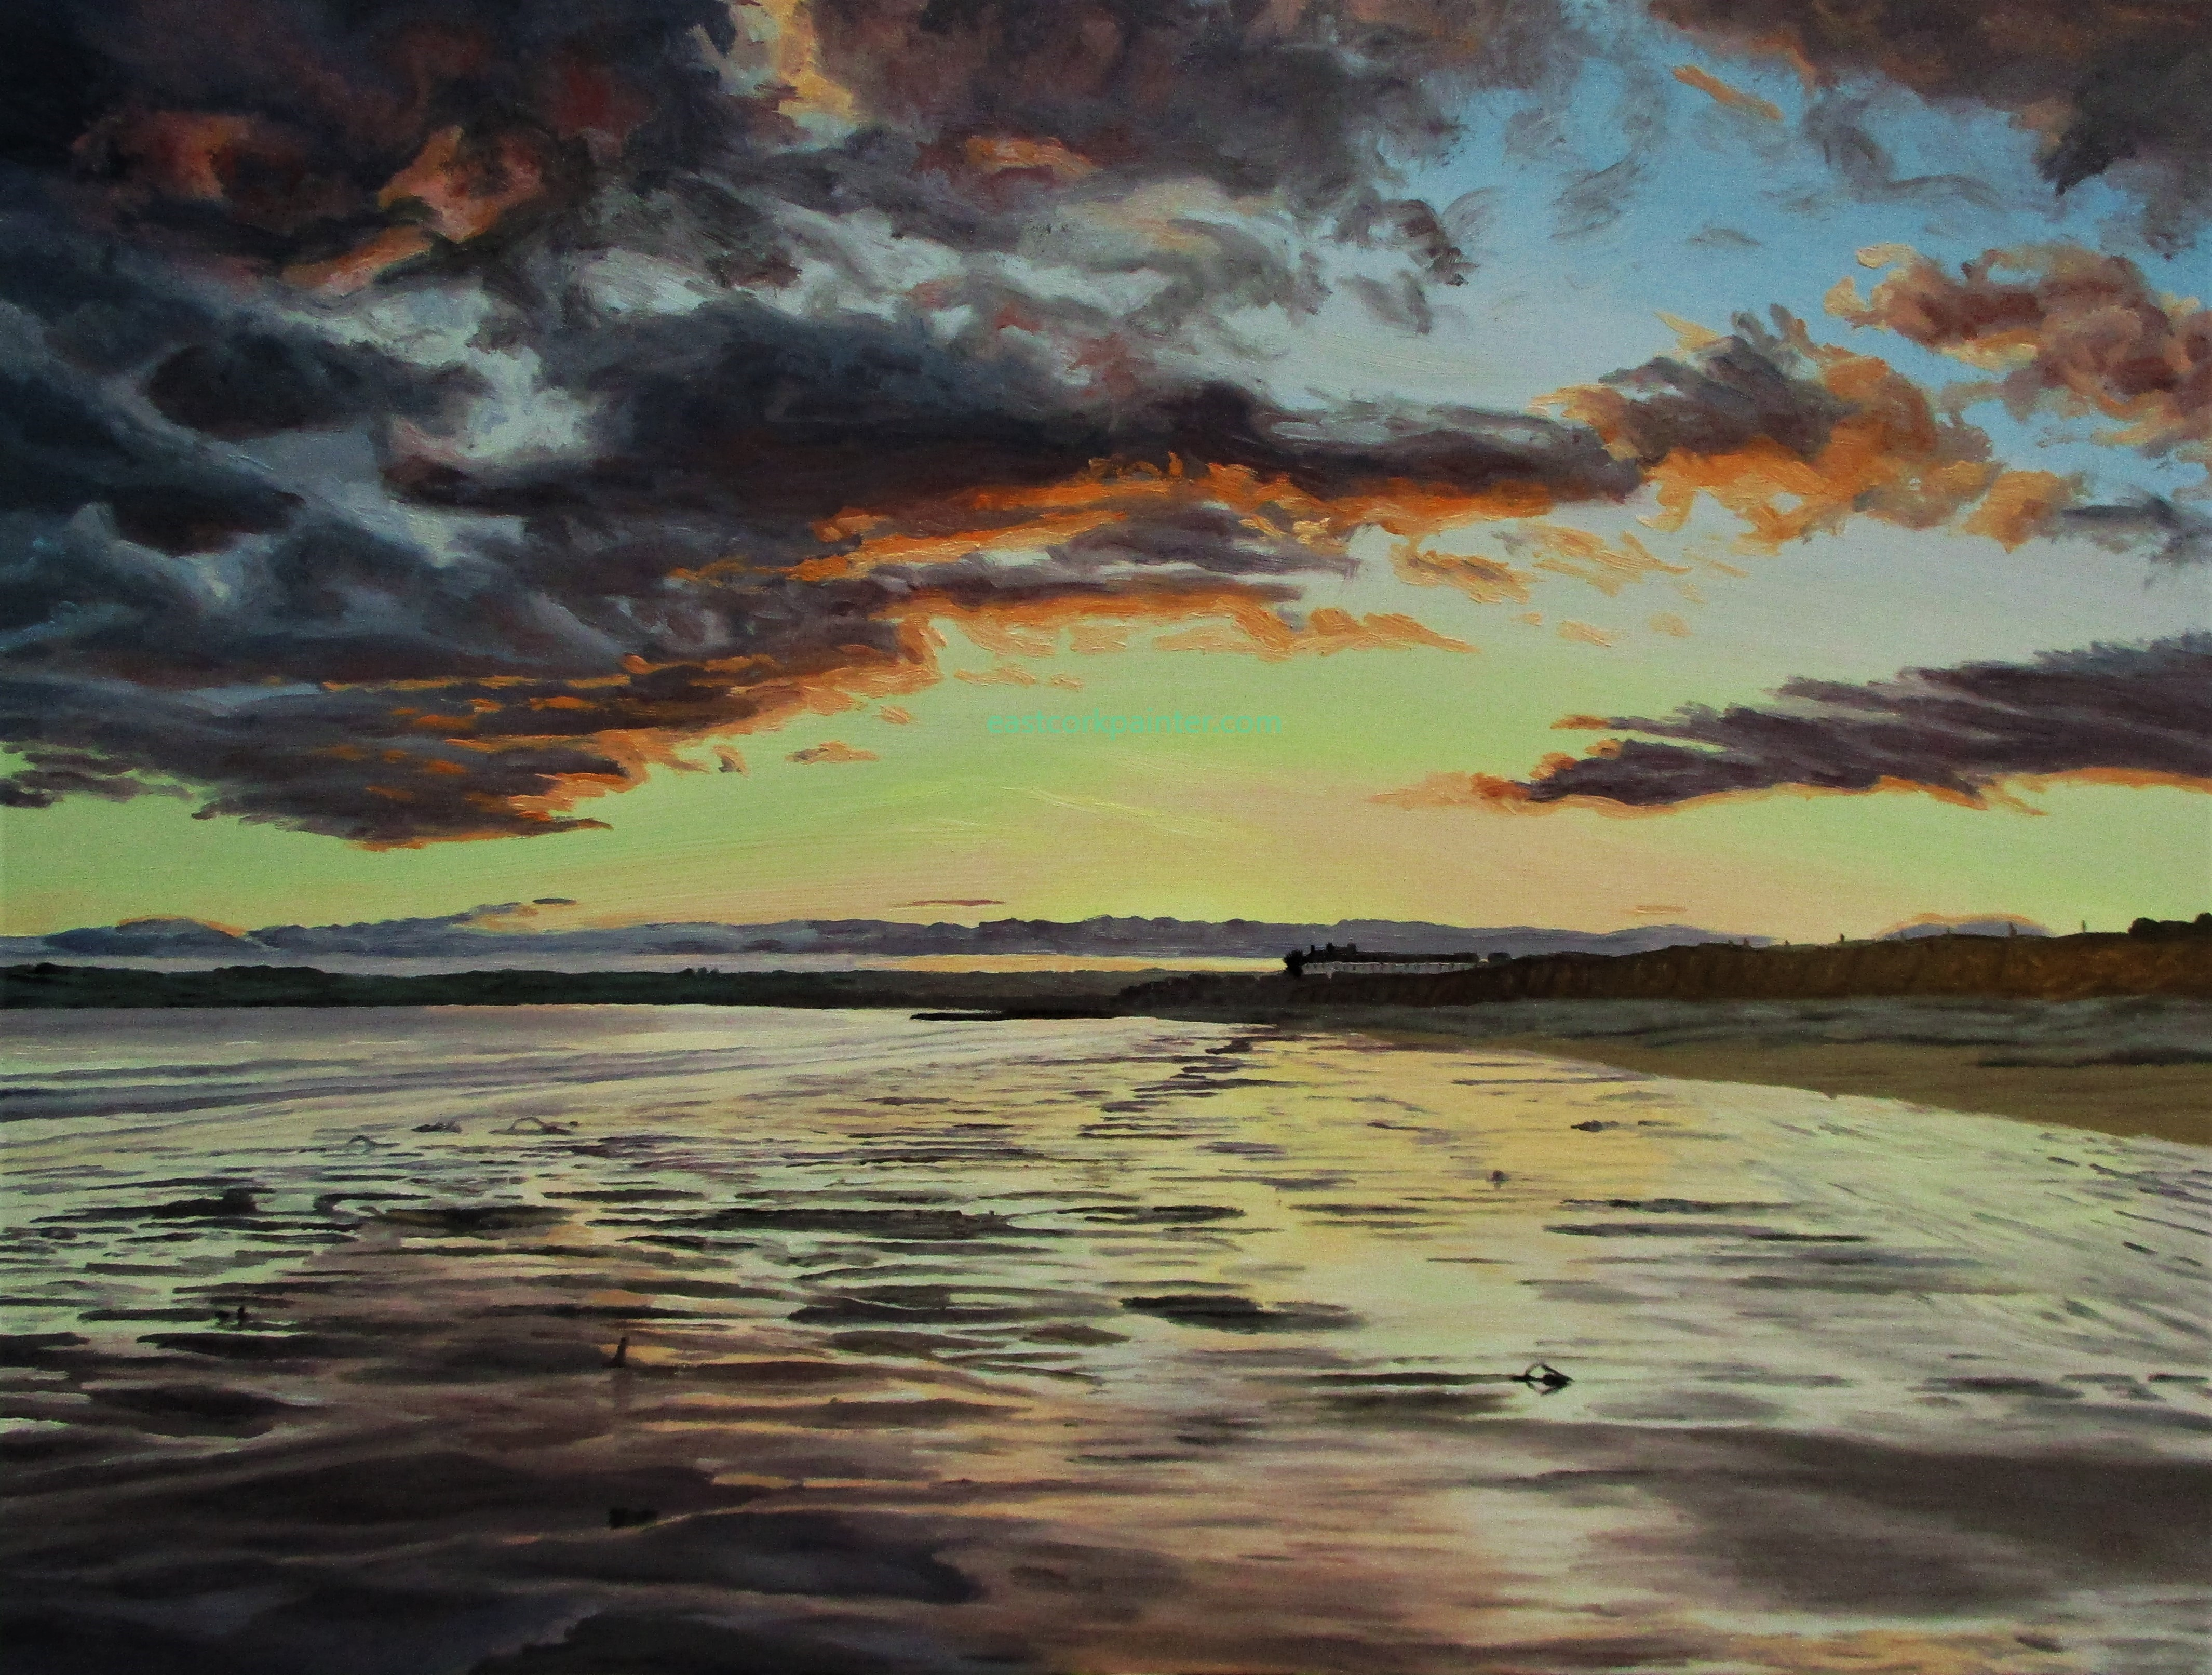 Evening Sky Over Garryvoe Beach